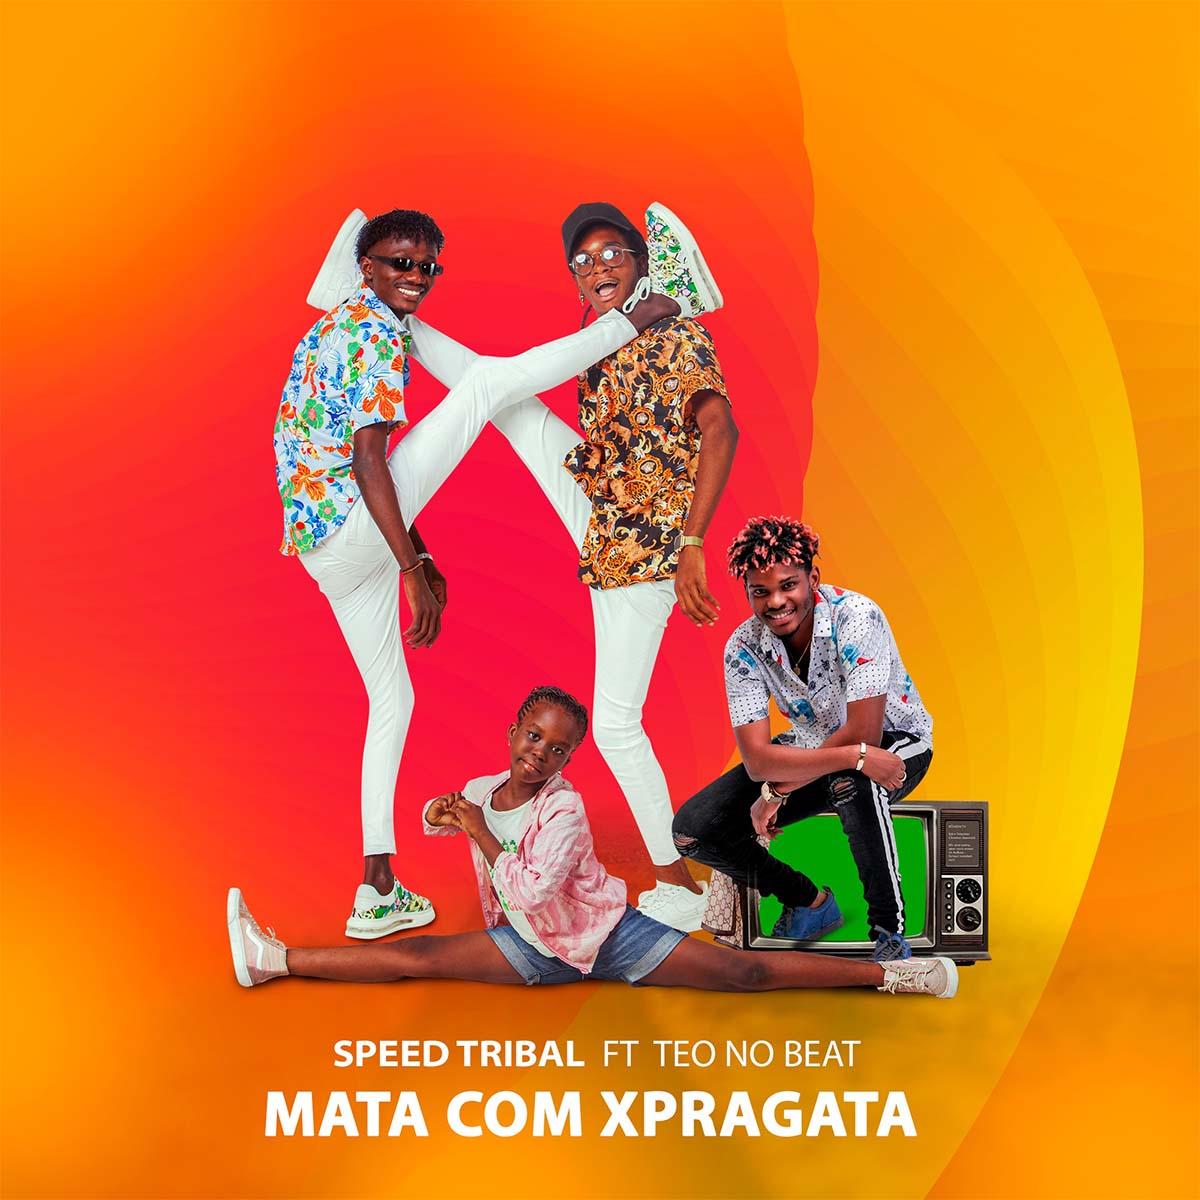 Speed Tribal - Mata Com Xpragata (feat. Teo No Beatz)